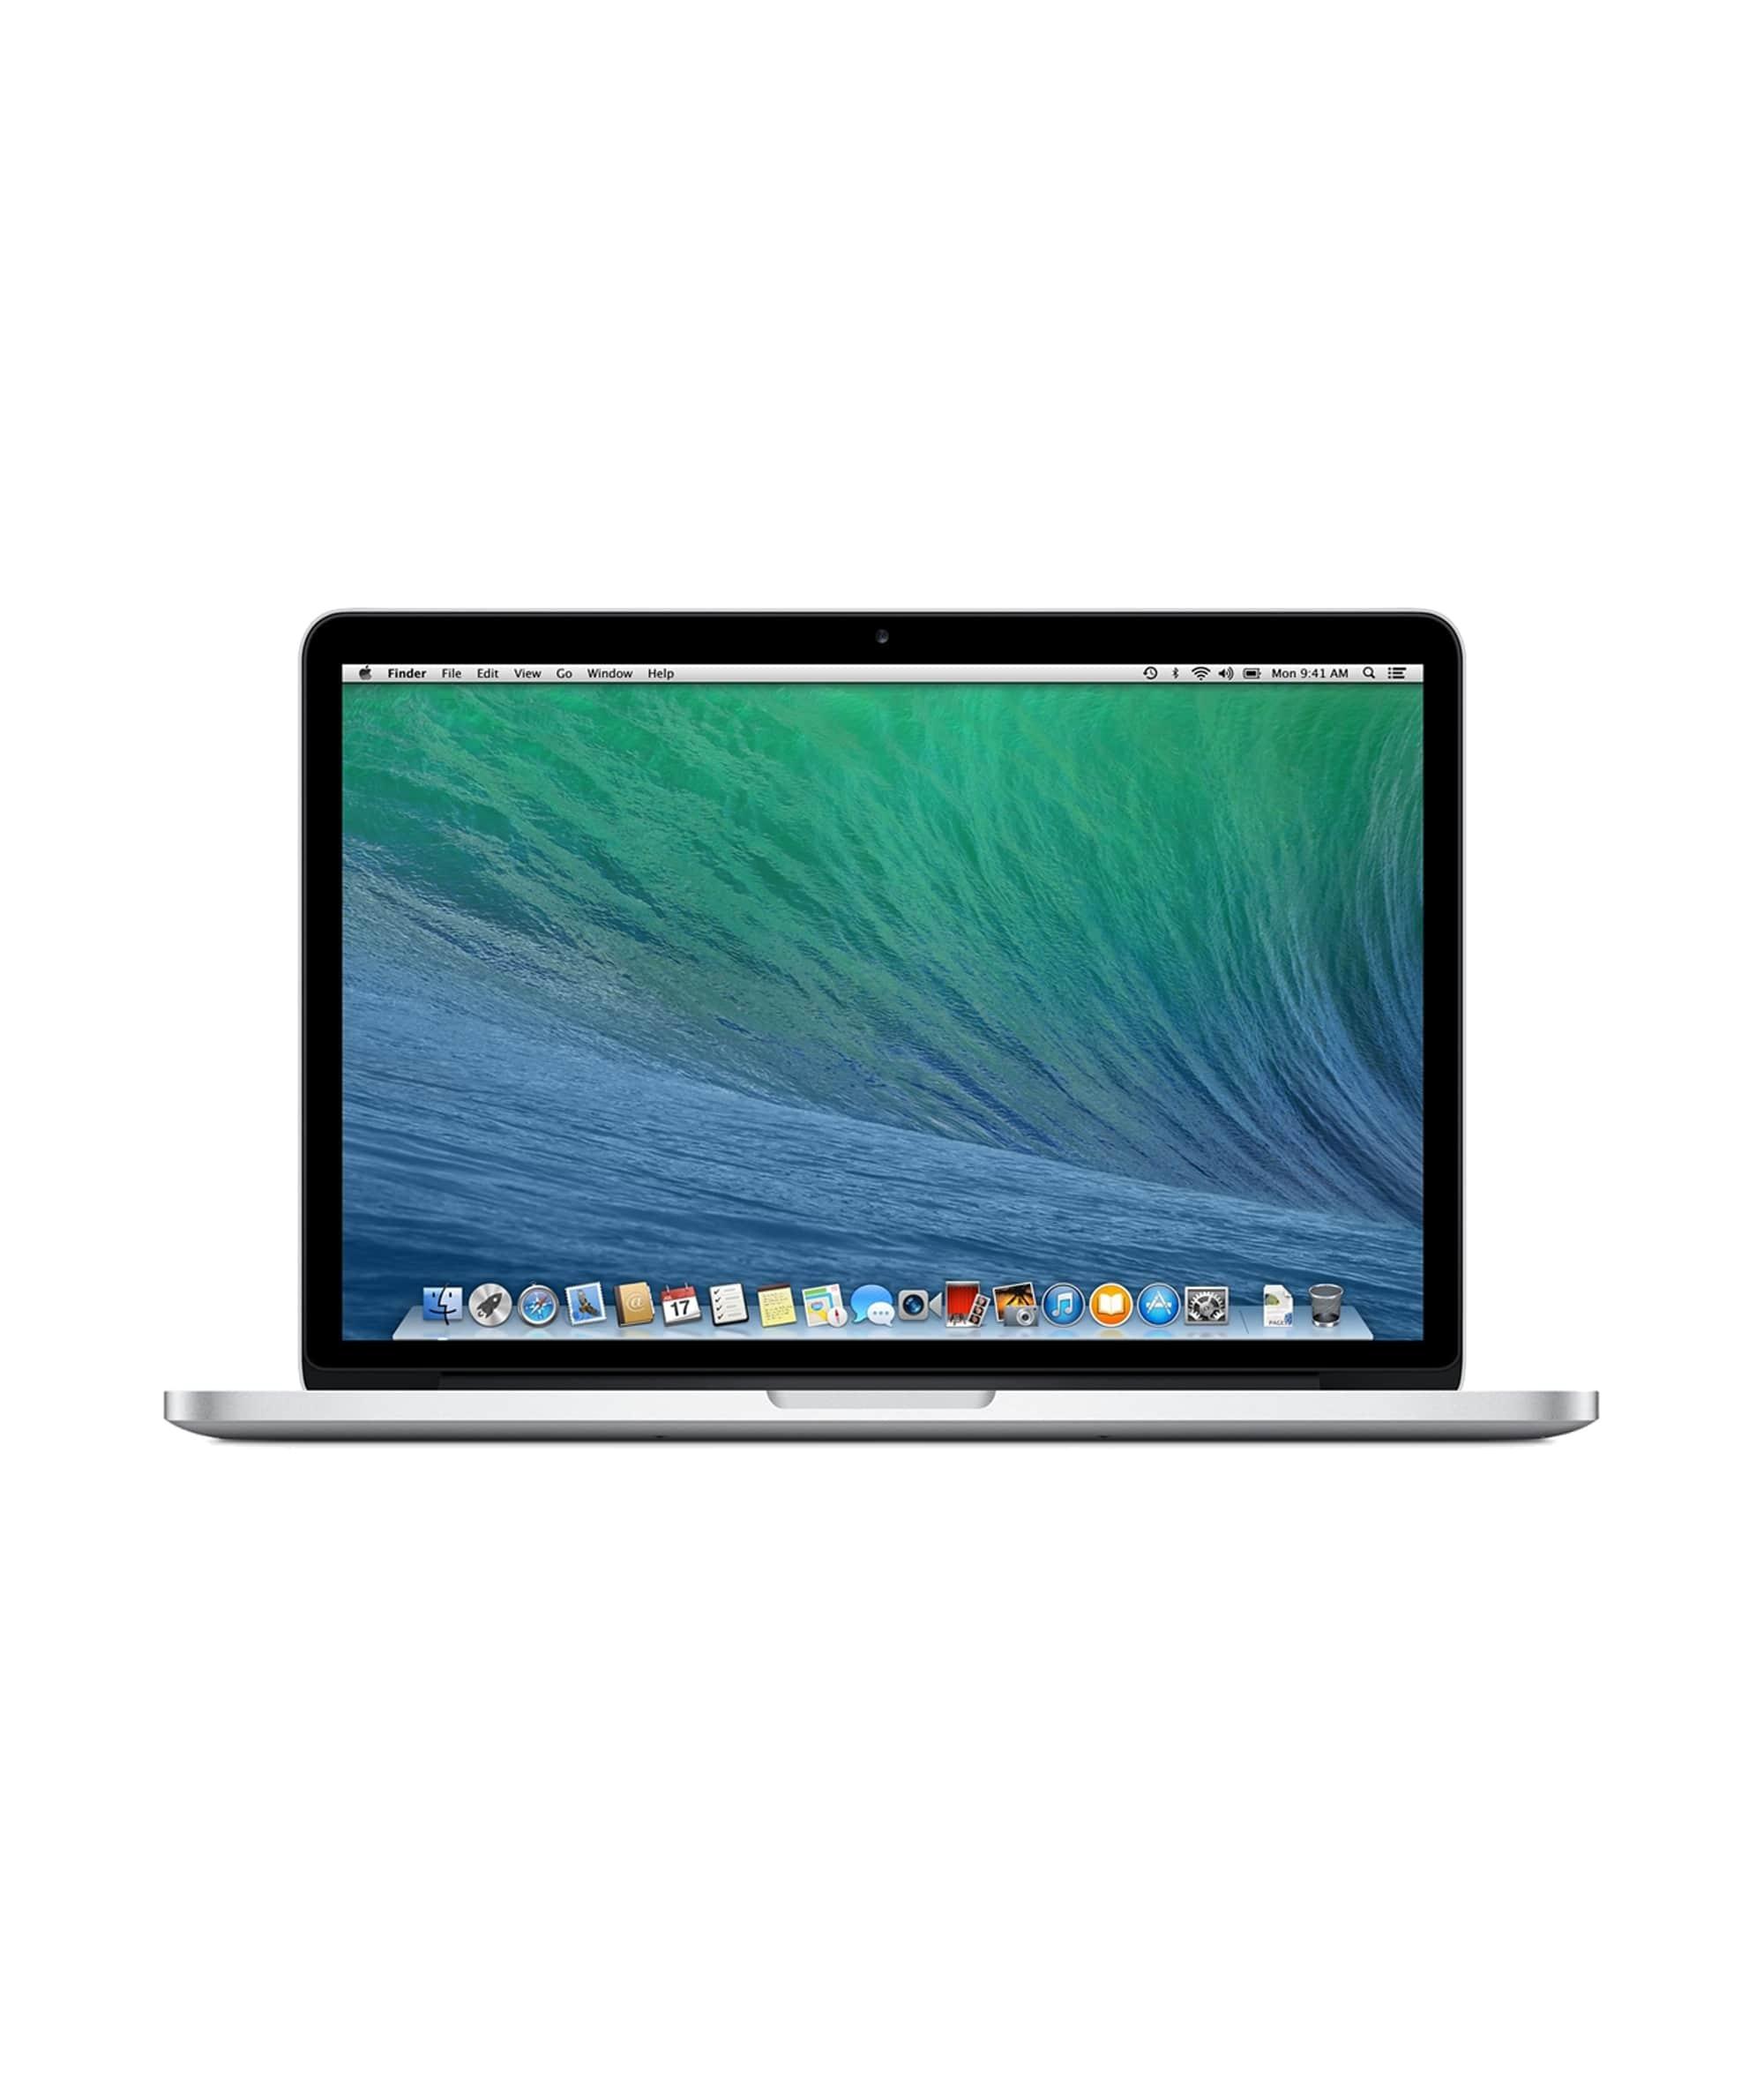 Vendere-Valutare-MacBook Pro Unibody 13 pollici